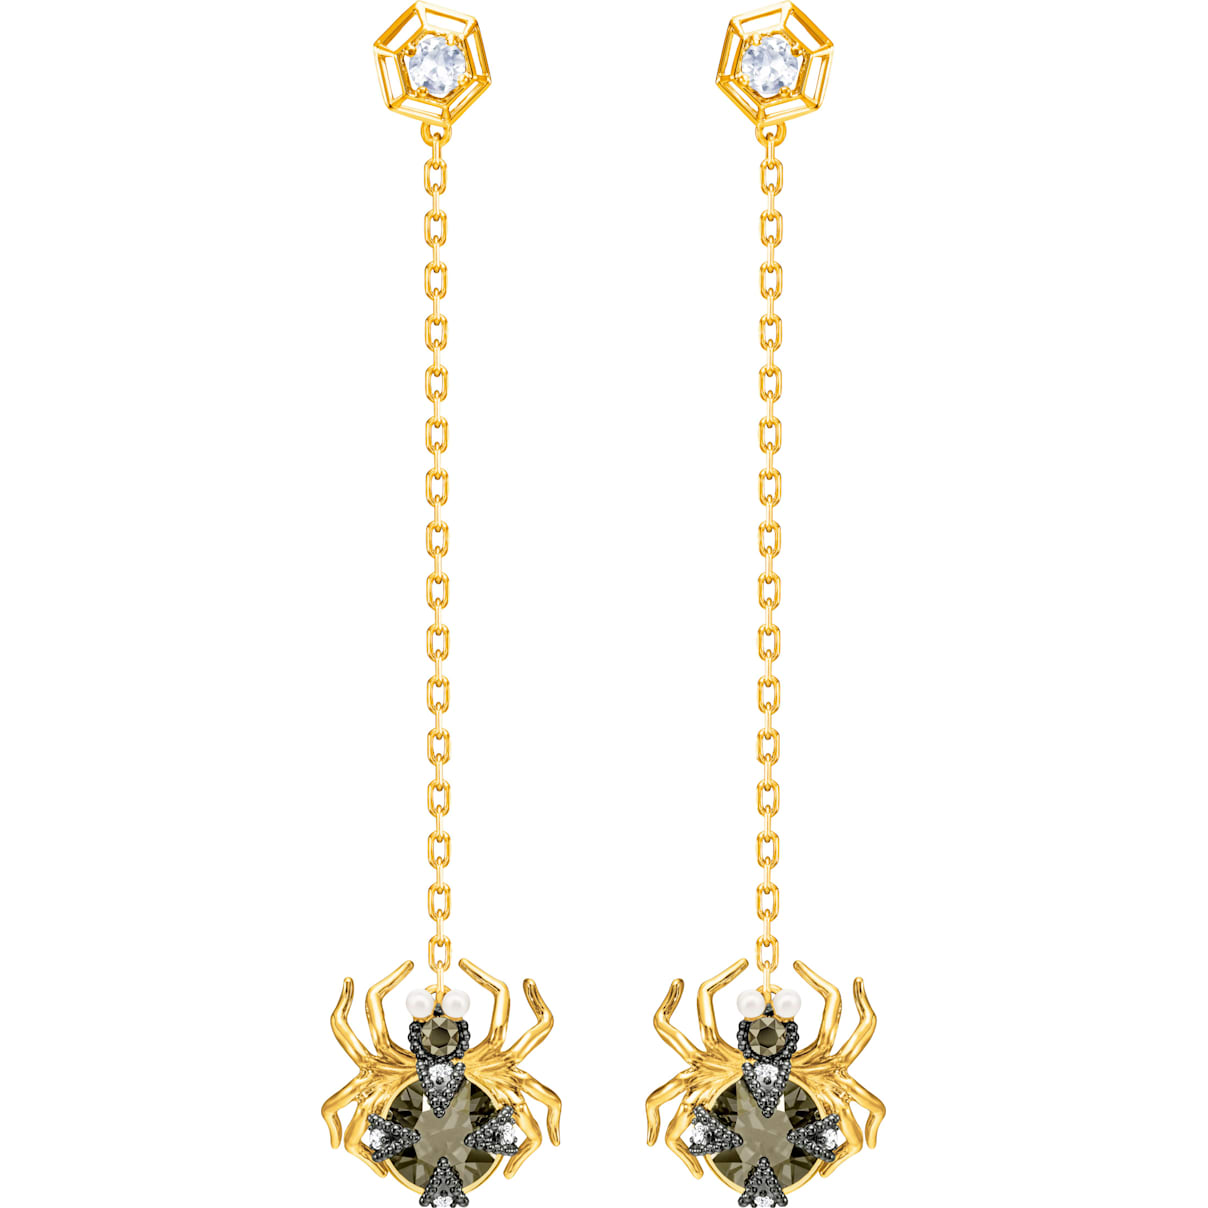 Swarovski Magnetic Pierced Earrings, Multi-colored, Mixed metal finish